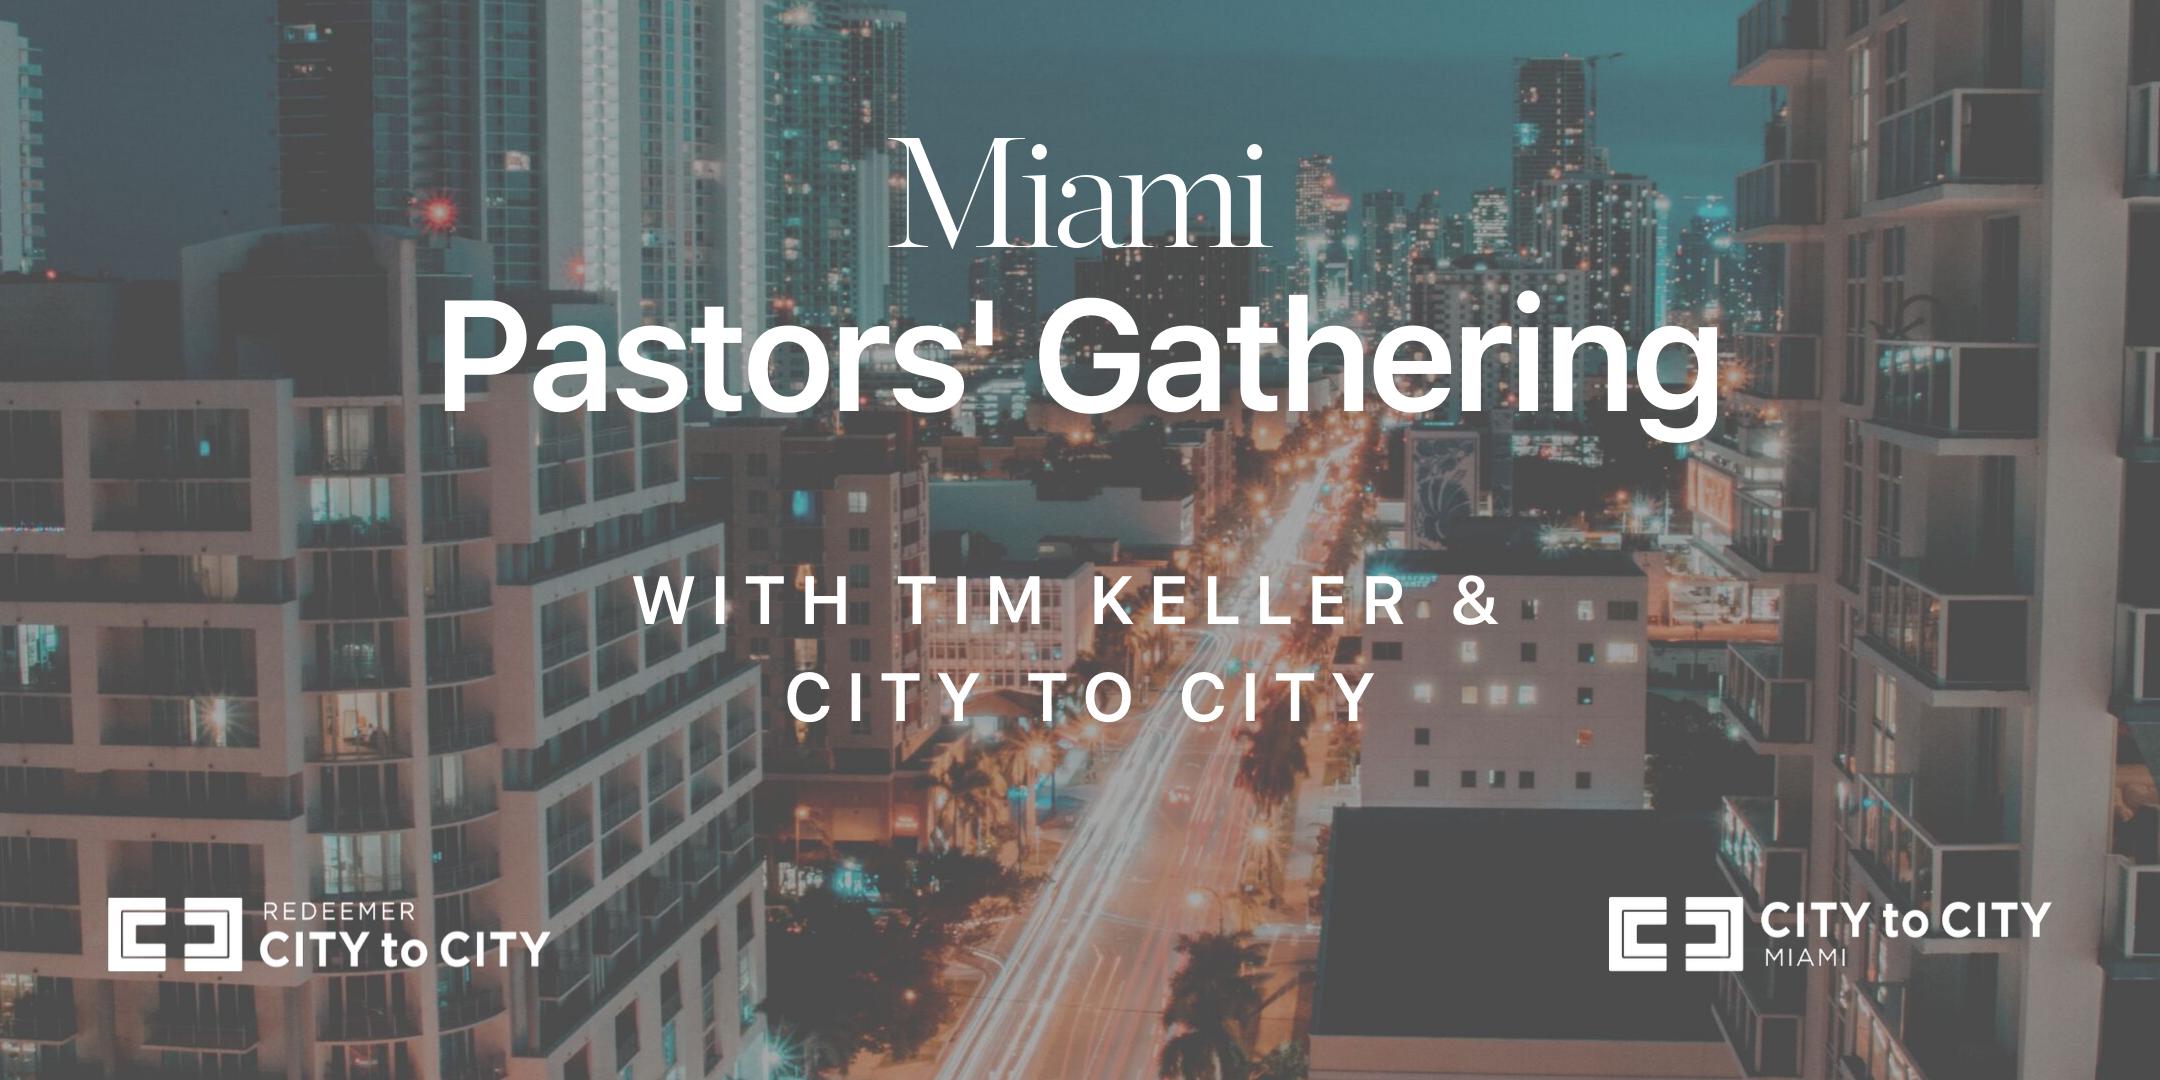 Miami Pastors Gathering with Tim Keller